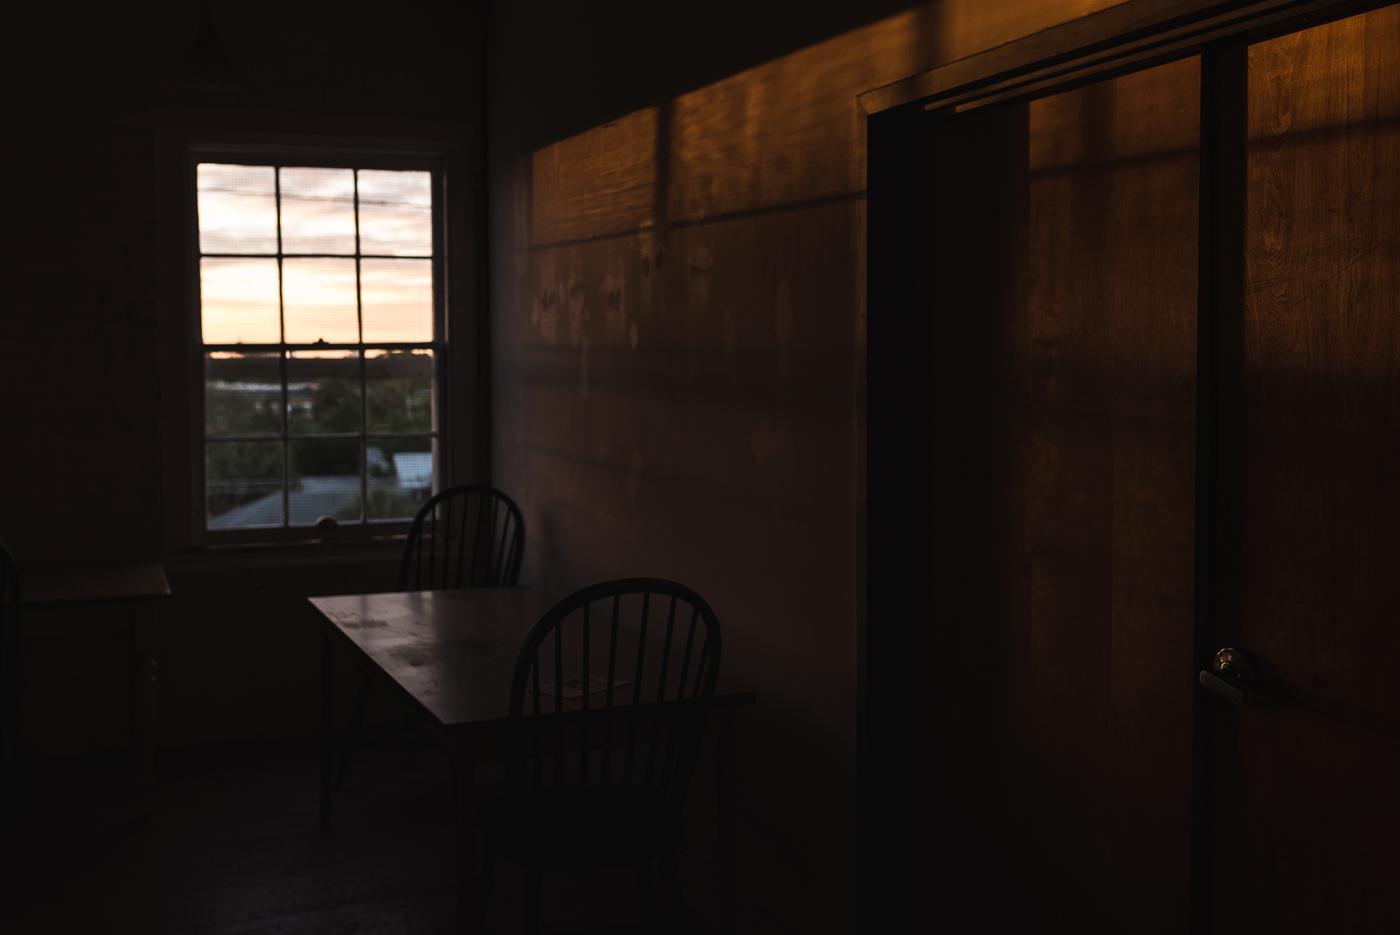 'Studio Glow' by Alison Winterroth